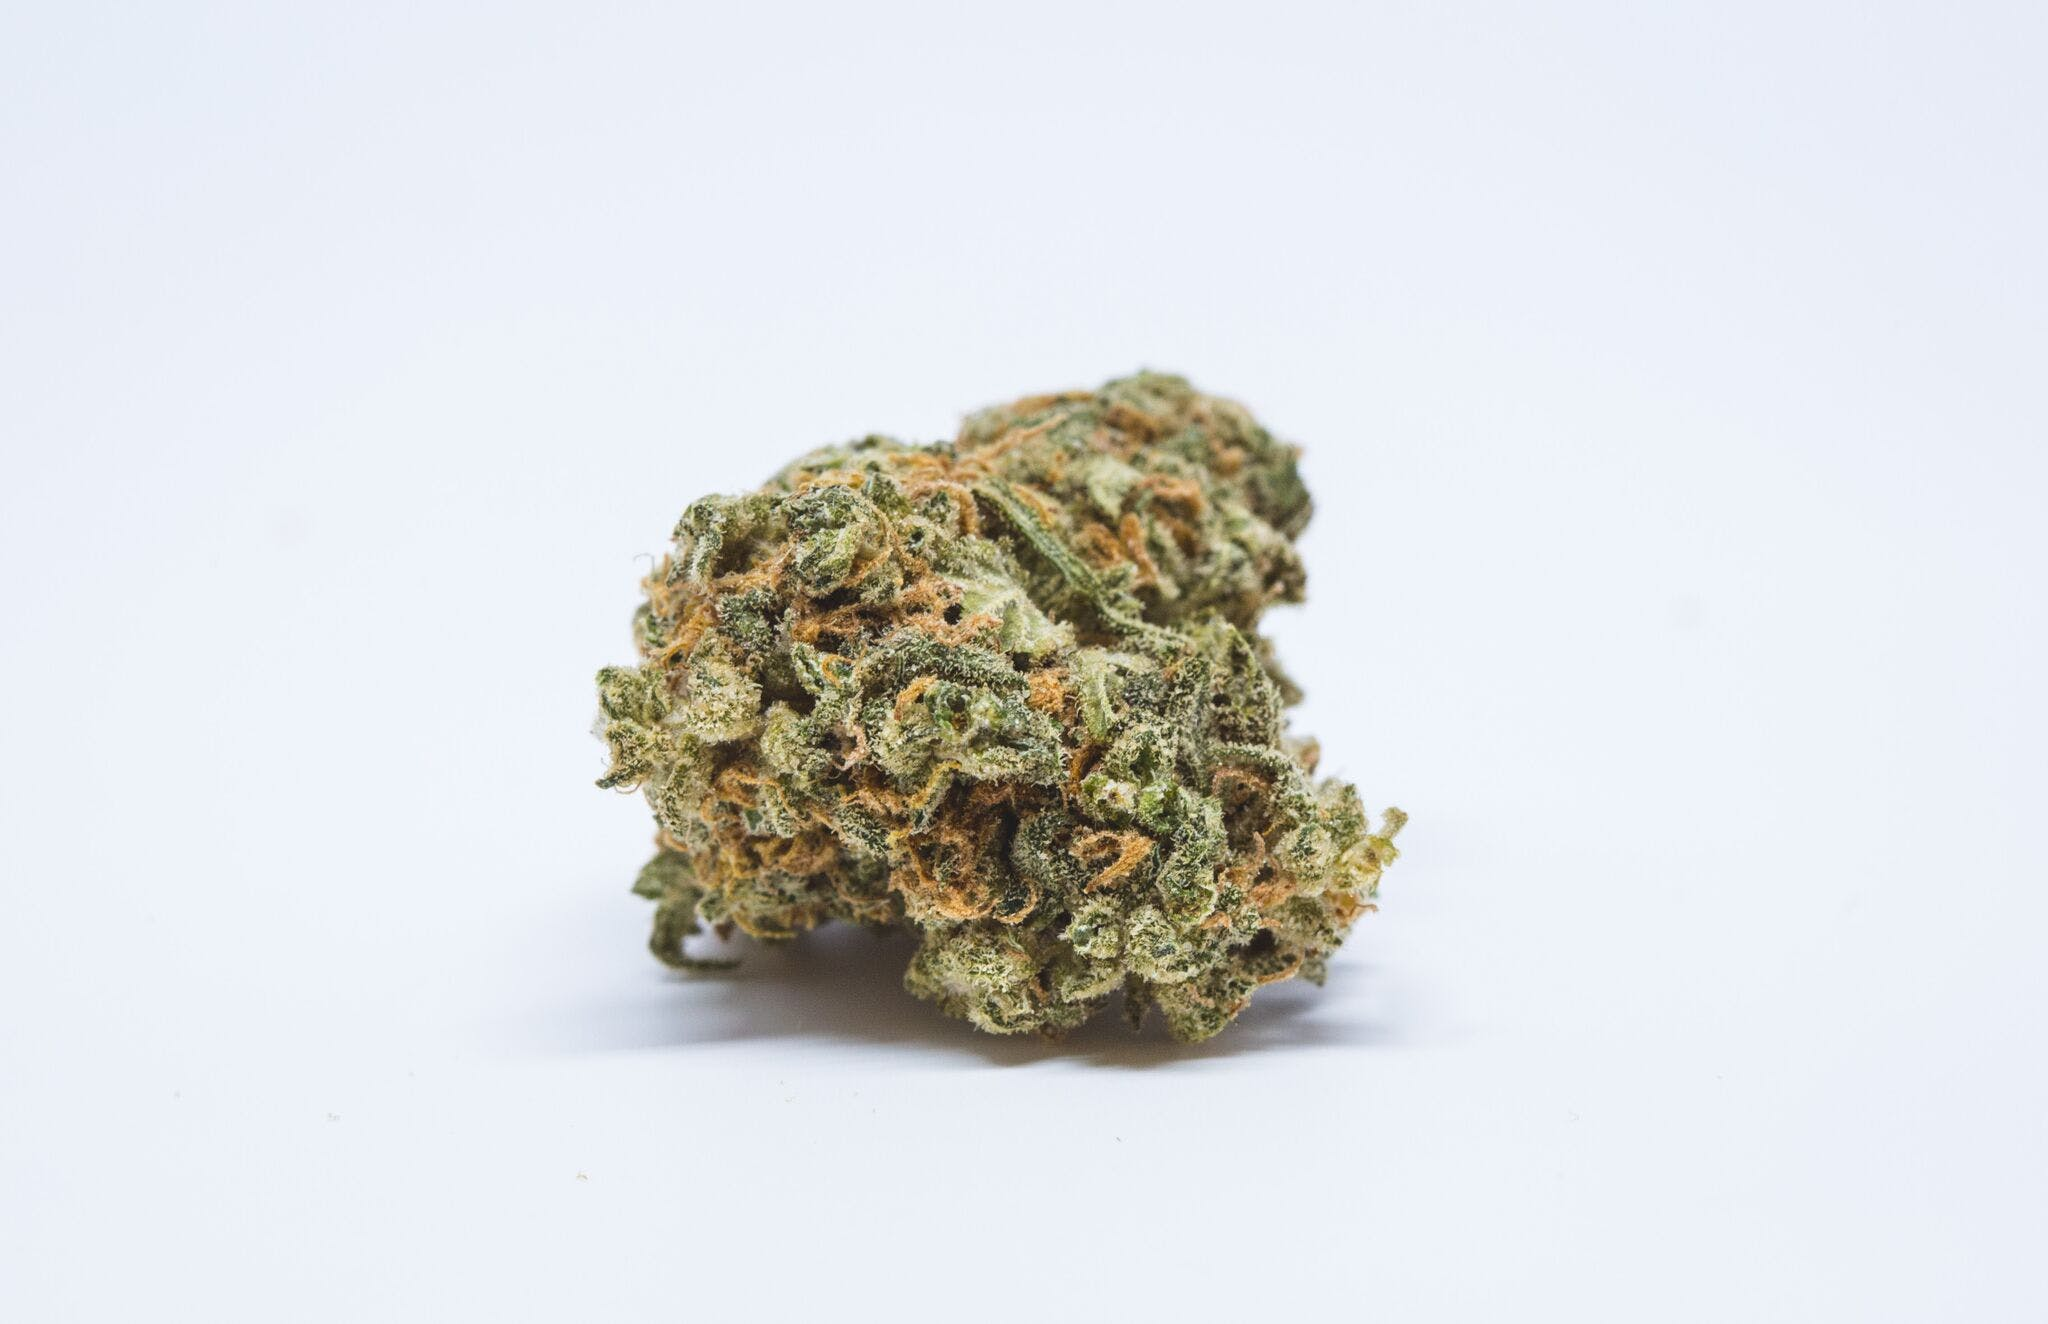 Orange Haze Weed; Orange Haze Cannabis Strain; Orange Haze Hybrid Marijuana Strain